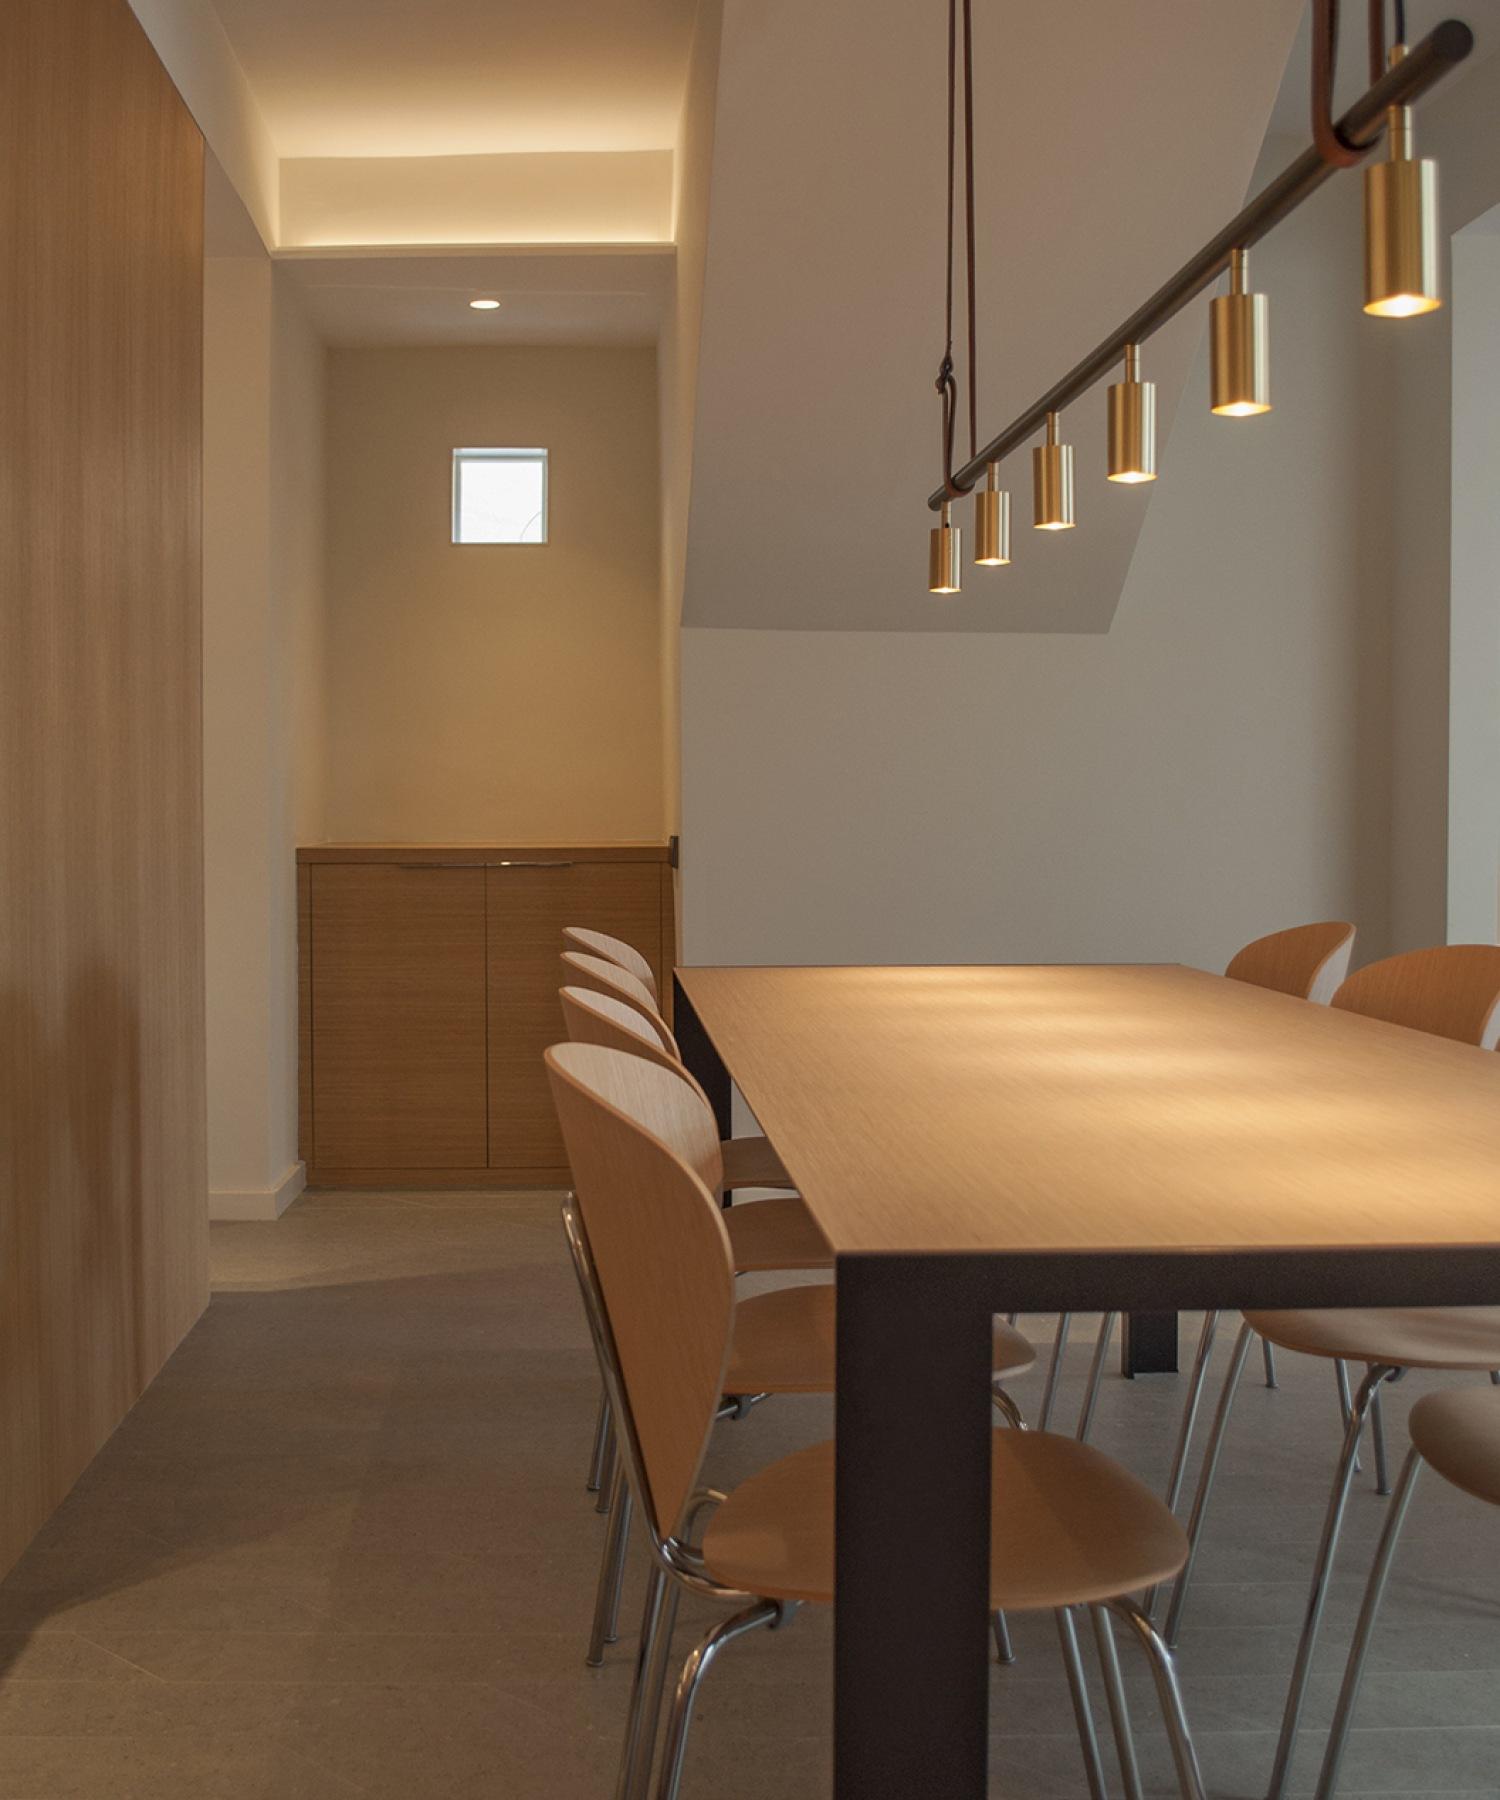 11-architecture-sitges-interior-design-barcelona-dinning-room-modern-ceramic-apavisa-globus-stua-deneb-wood